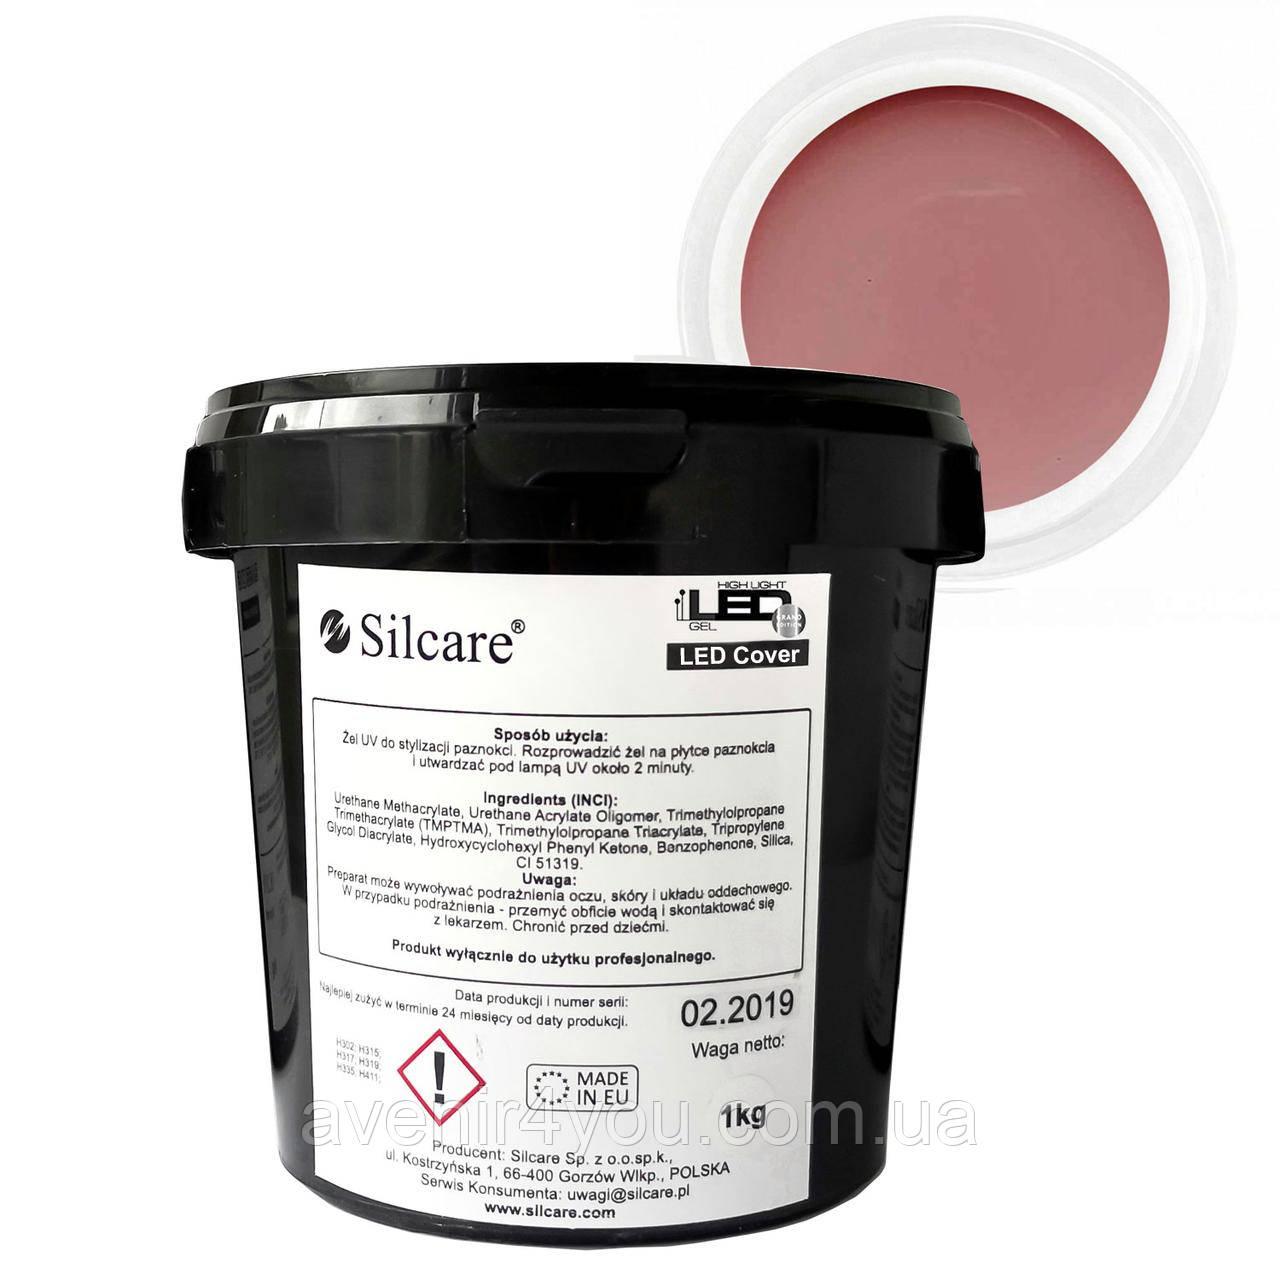 Гель Silcare Силкар LED Cover, 1 кг ОПТ